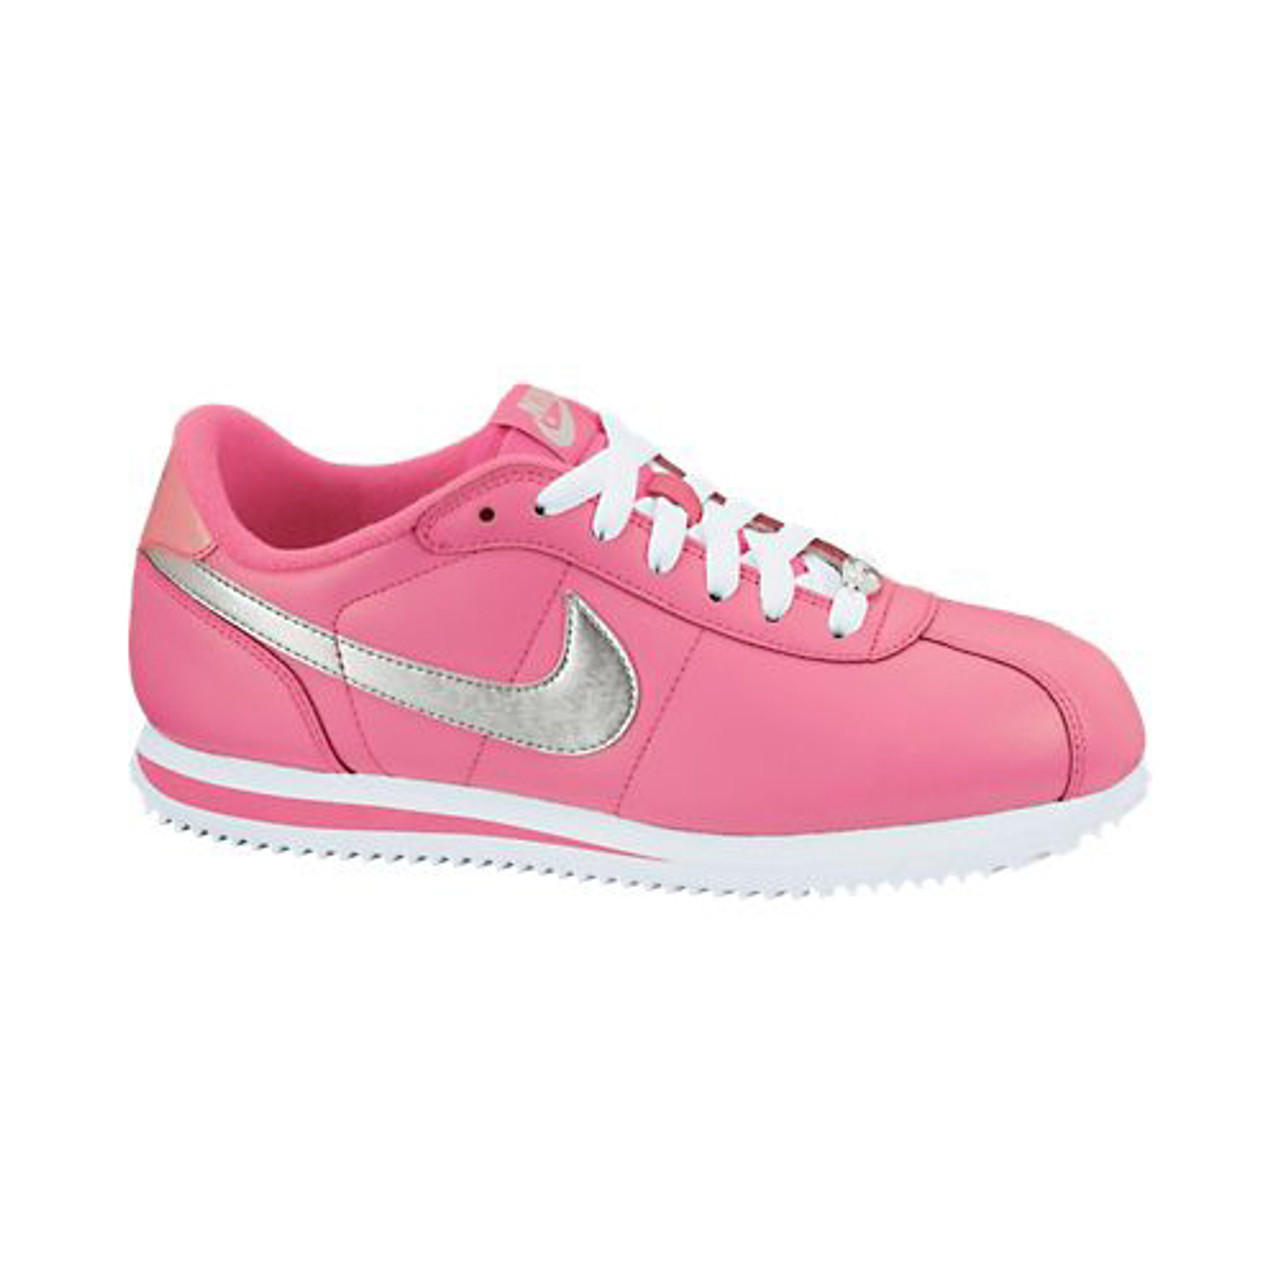 buy online bcbb2 a36d4 Nike Cortez Basic Leather Pink White Silver Ladies Walking Shoes - Shop now